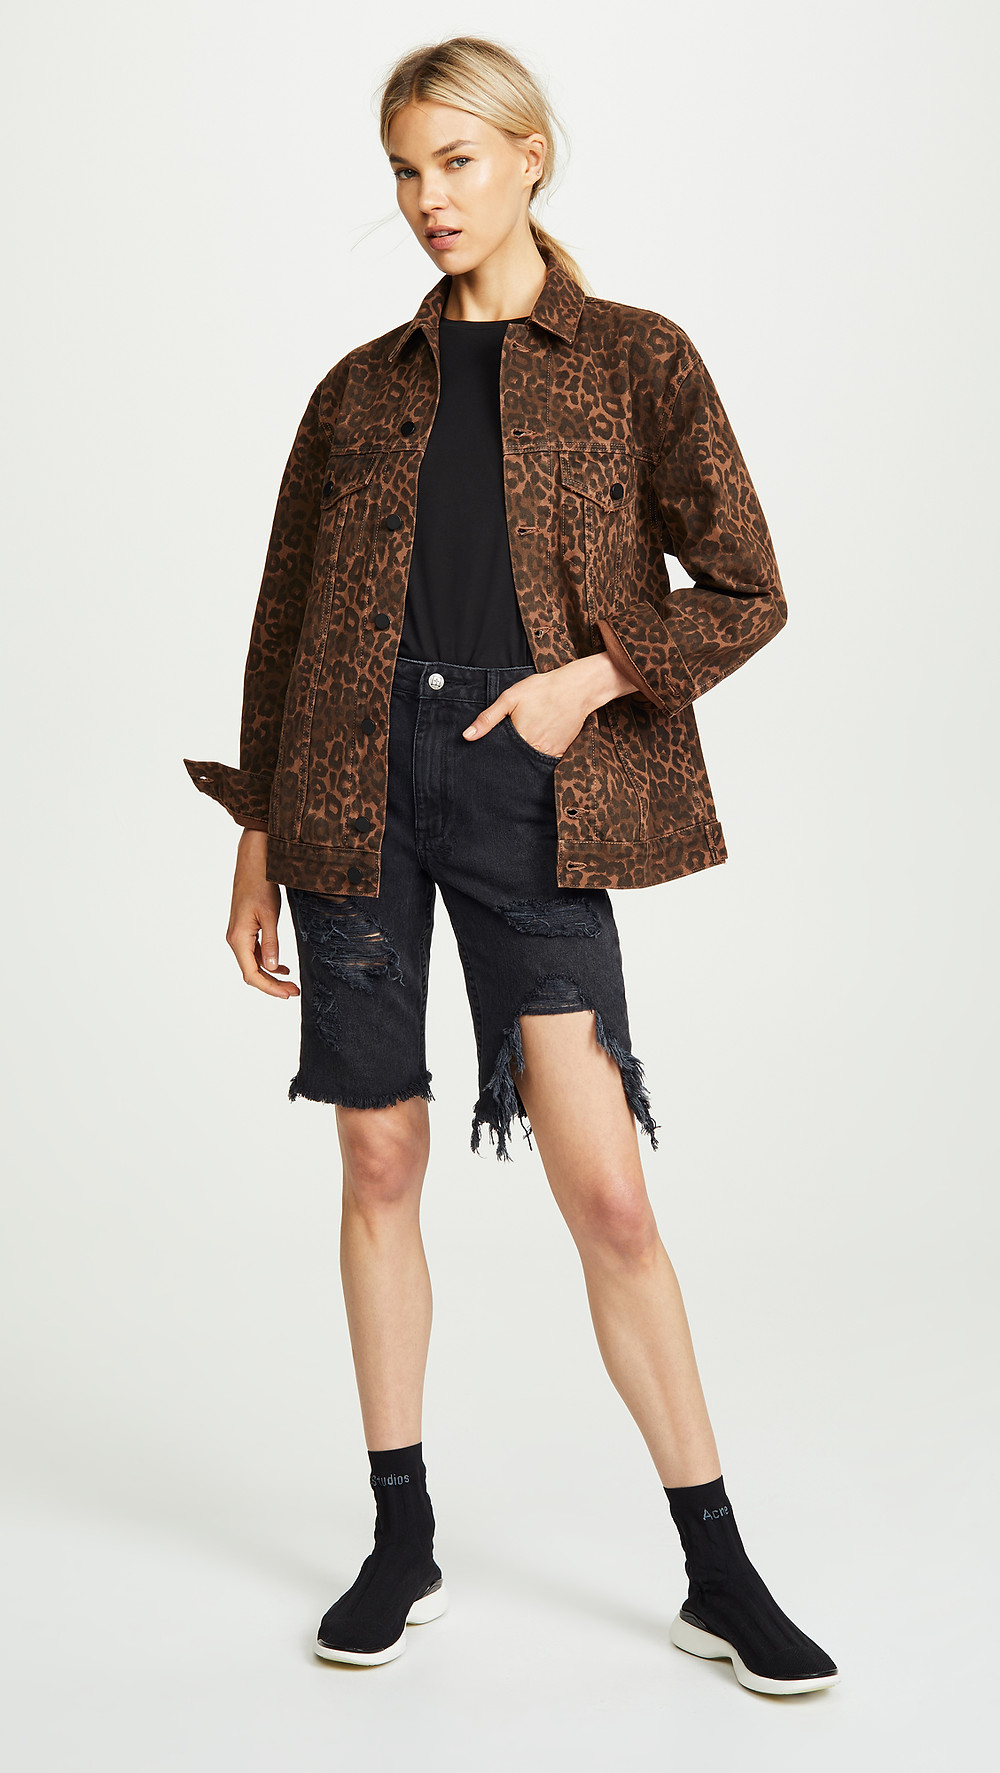 Denim x Alexander Wang Daze Leopard-Print Jacket $495